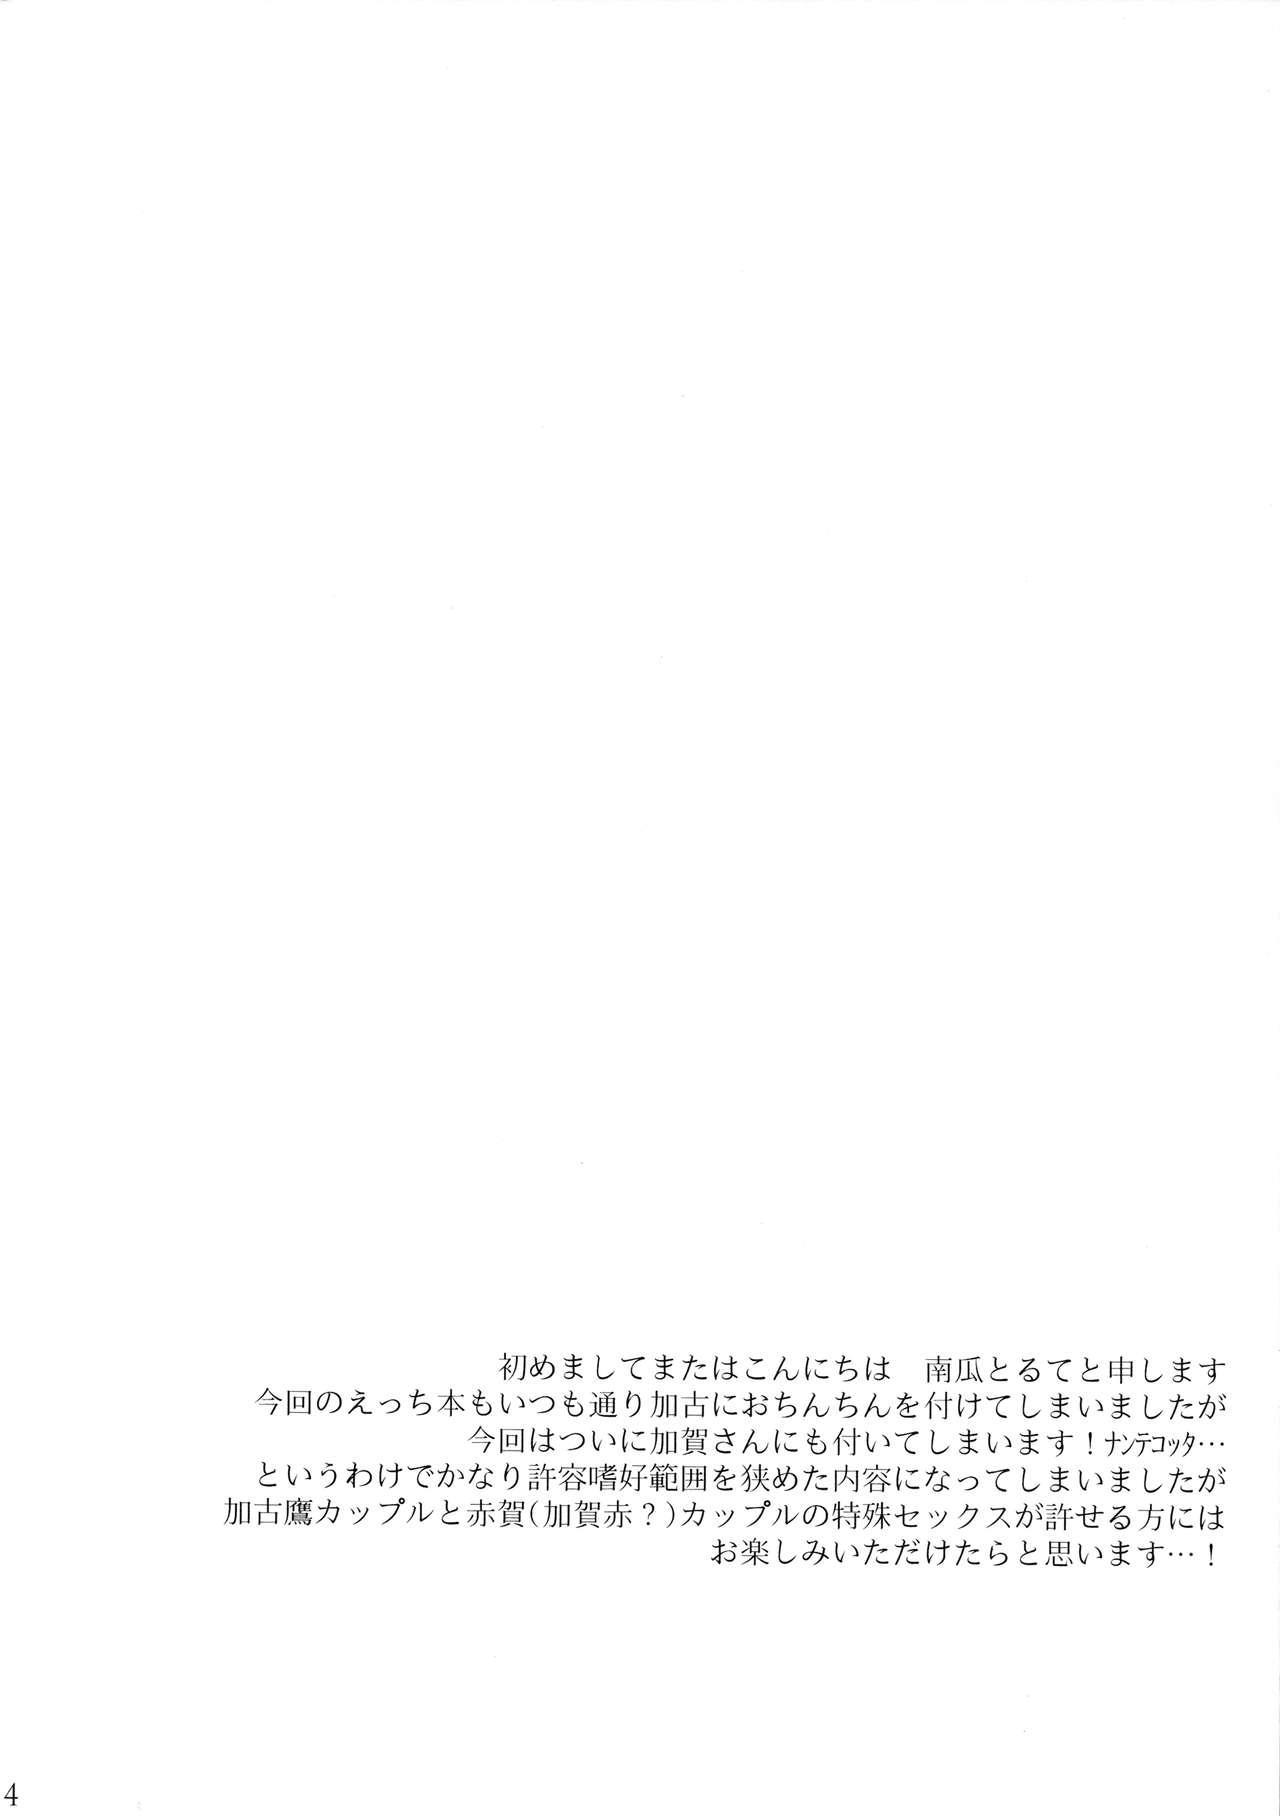 Toaru Koibito-tachi no Futari Ecchi 3